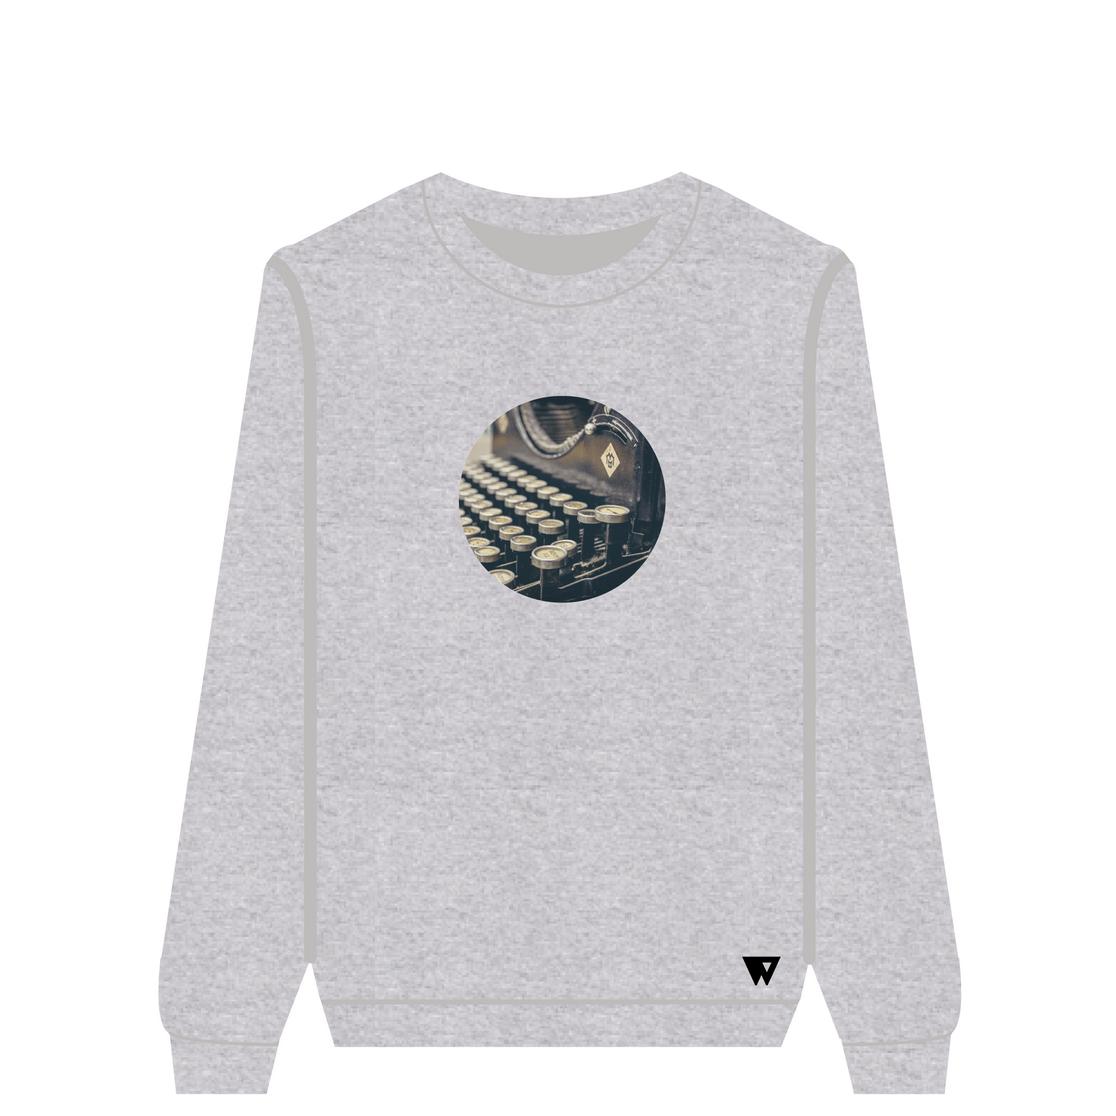 Sweatshirt Typeprint | Wuzzee